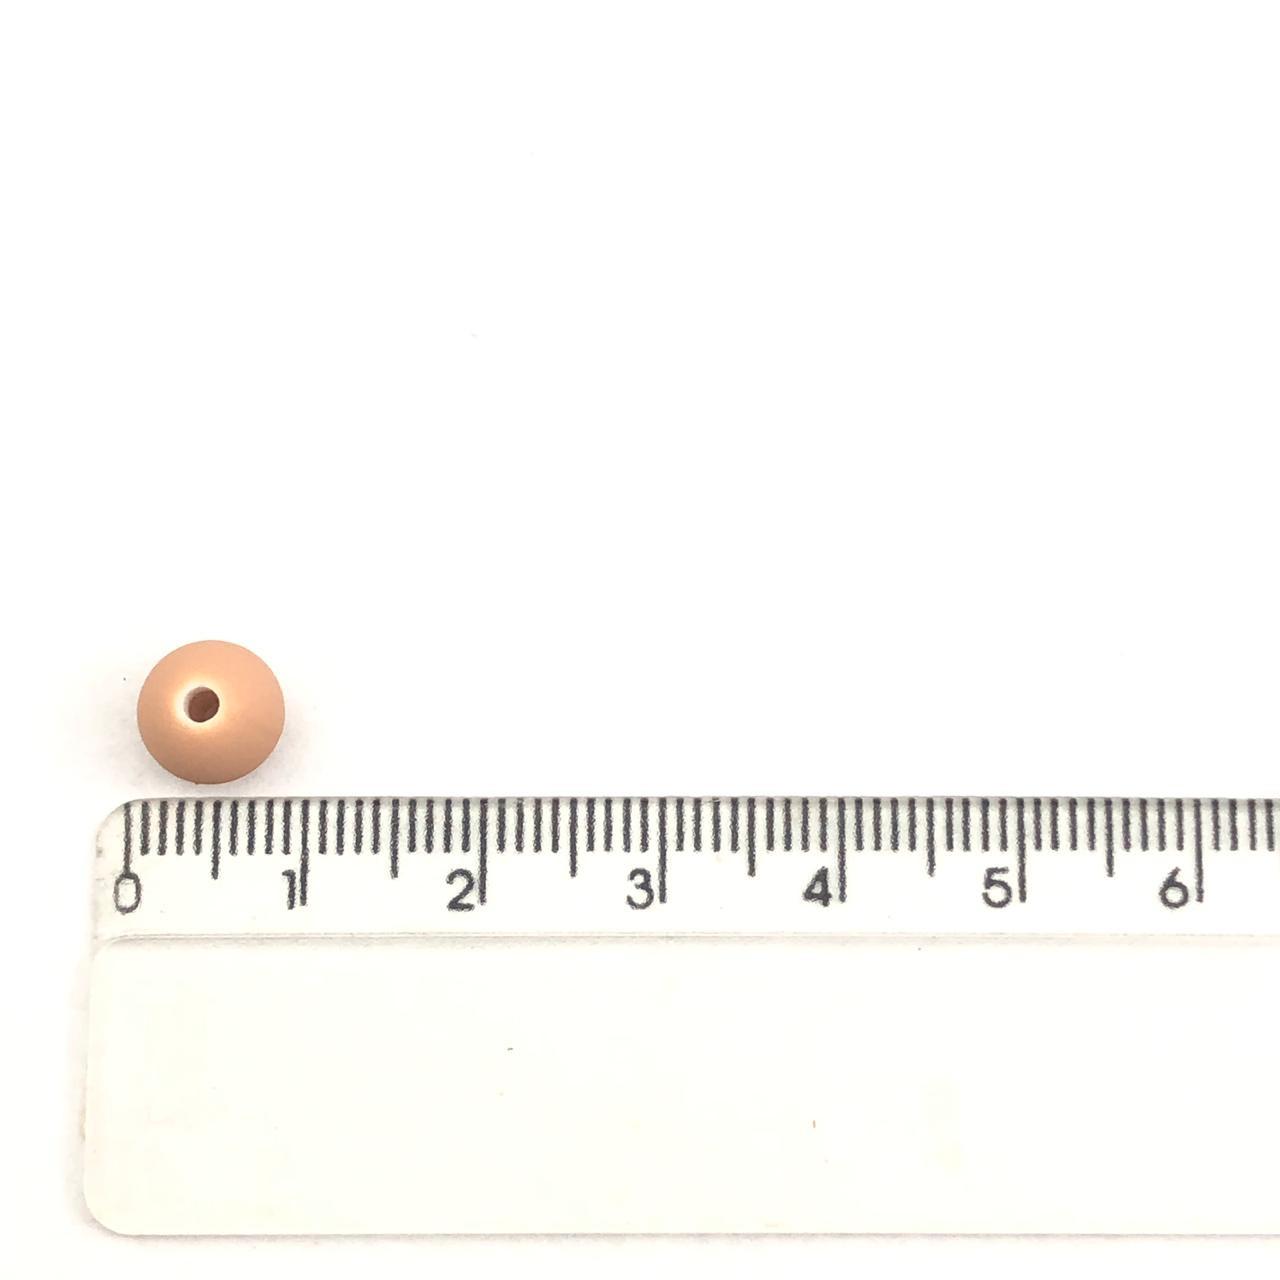 BOL267 - Bola Emborrachada Nude 8mm - 20Grs